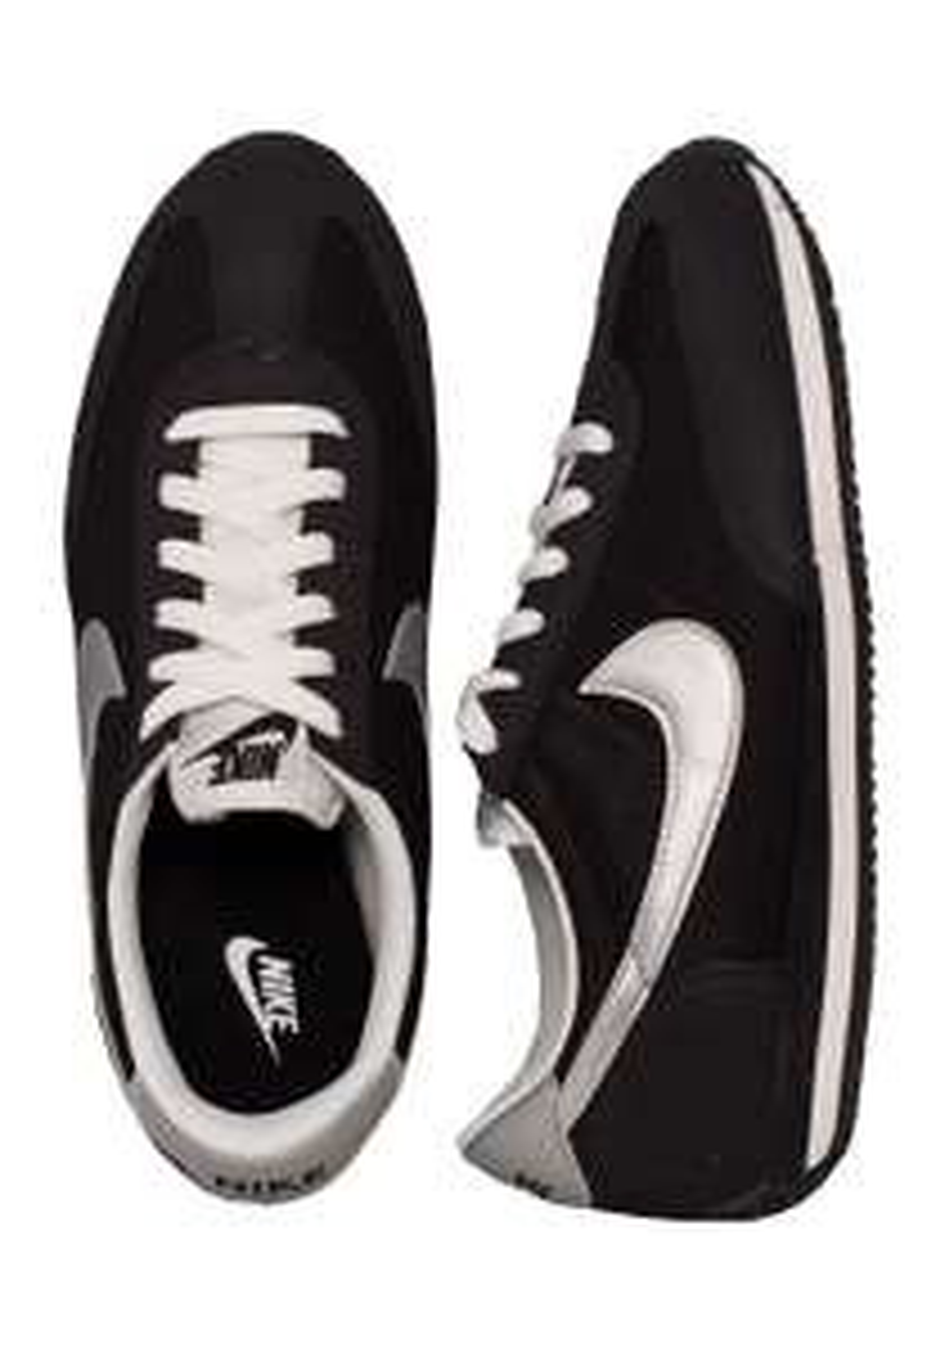 Nike - Oceania Black/Metallic Silver/Summit White - Girl Schuhe